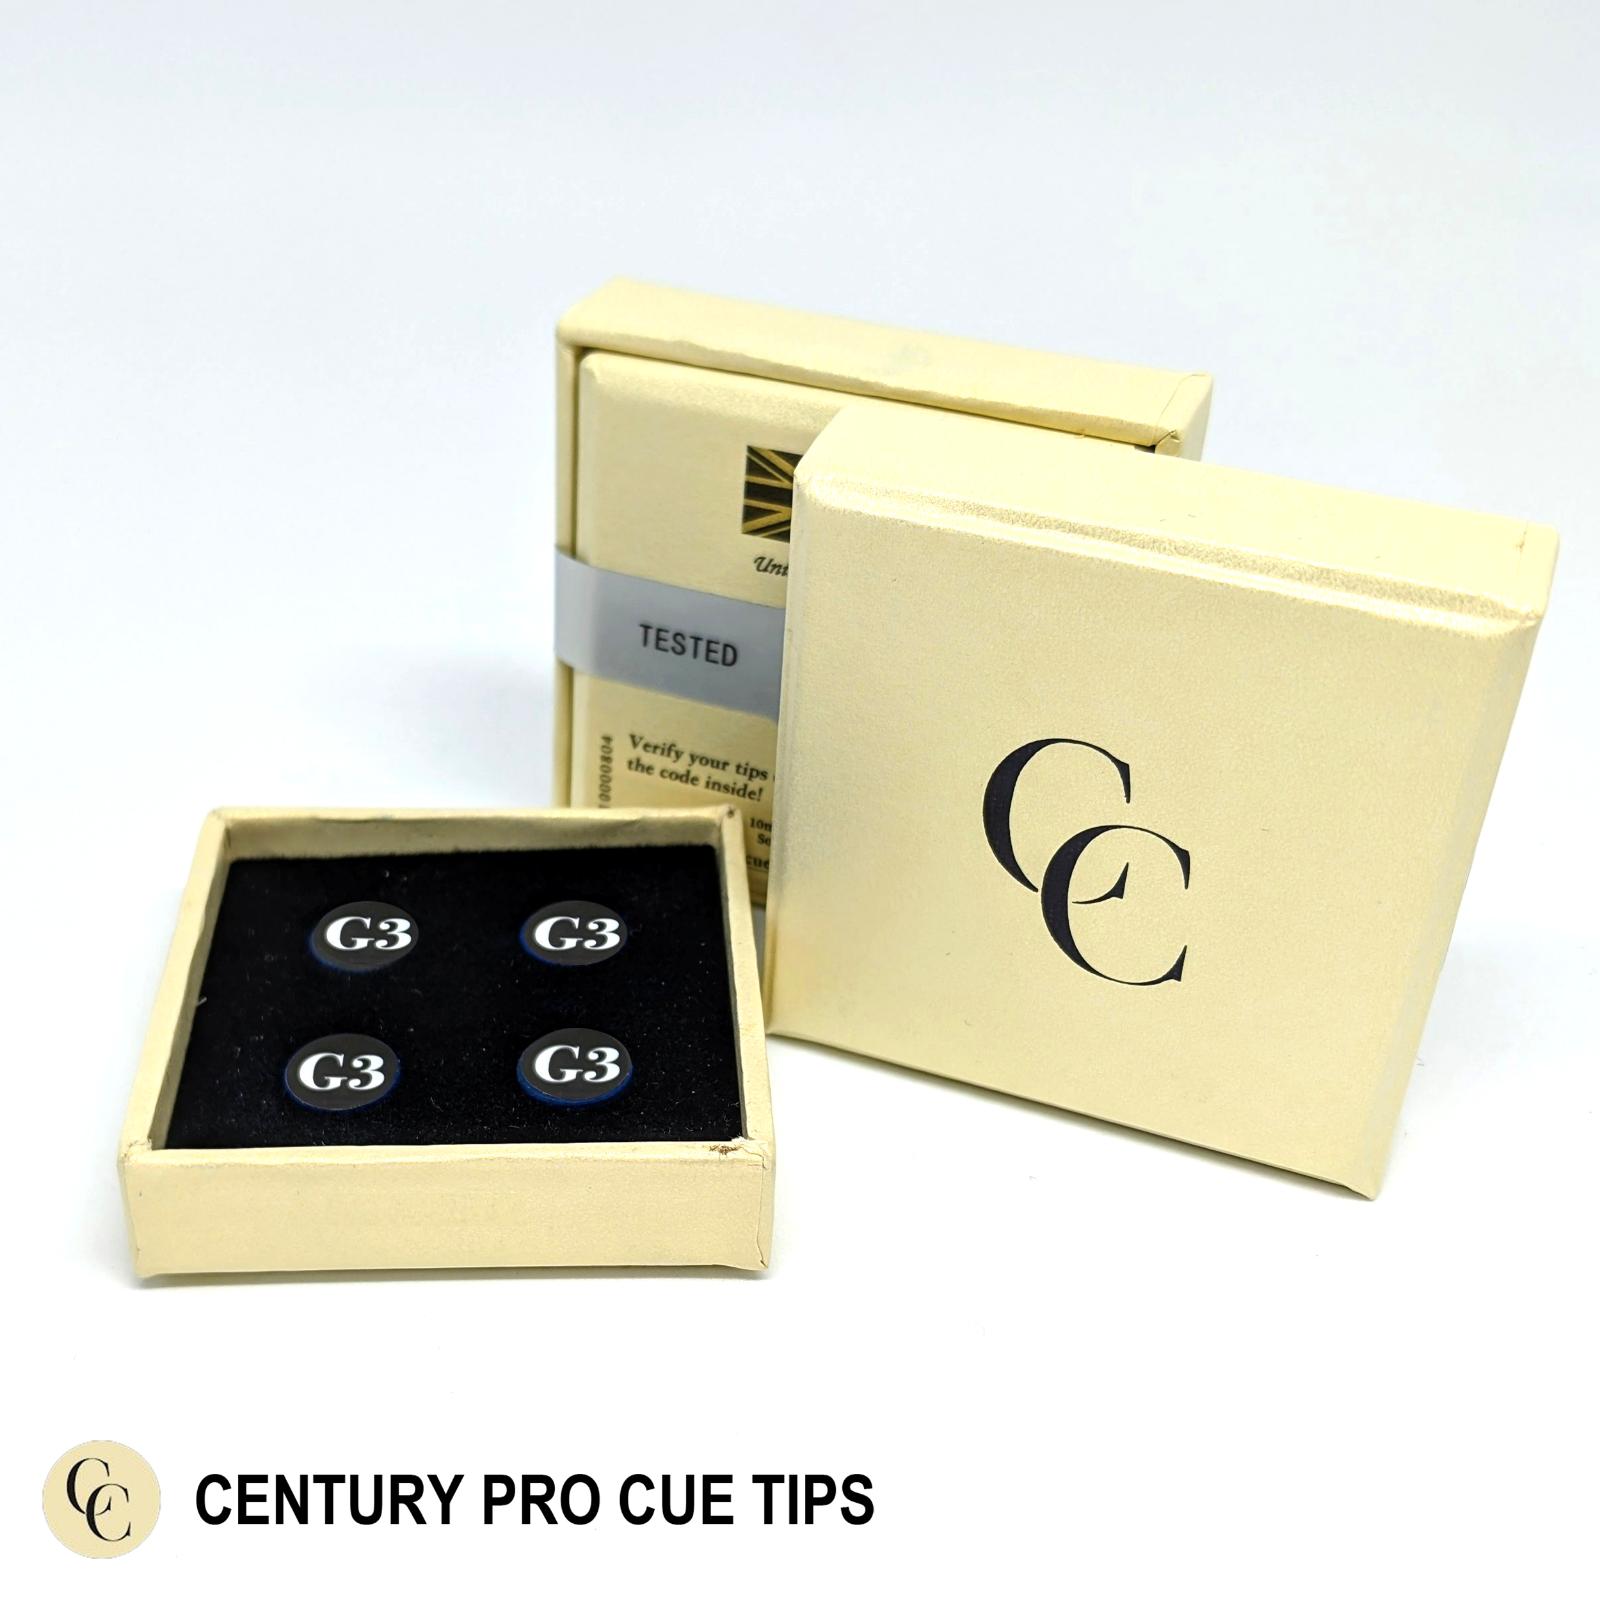 Century Pro Cue Tips (10mm) - G3 (M/H Grade) - 1 Box = 4 Tips - SALE!!